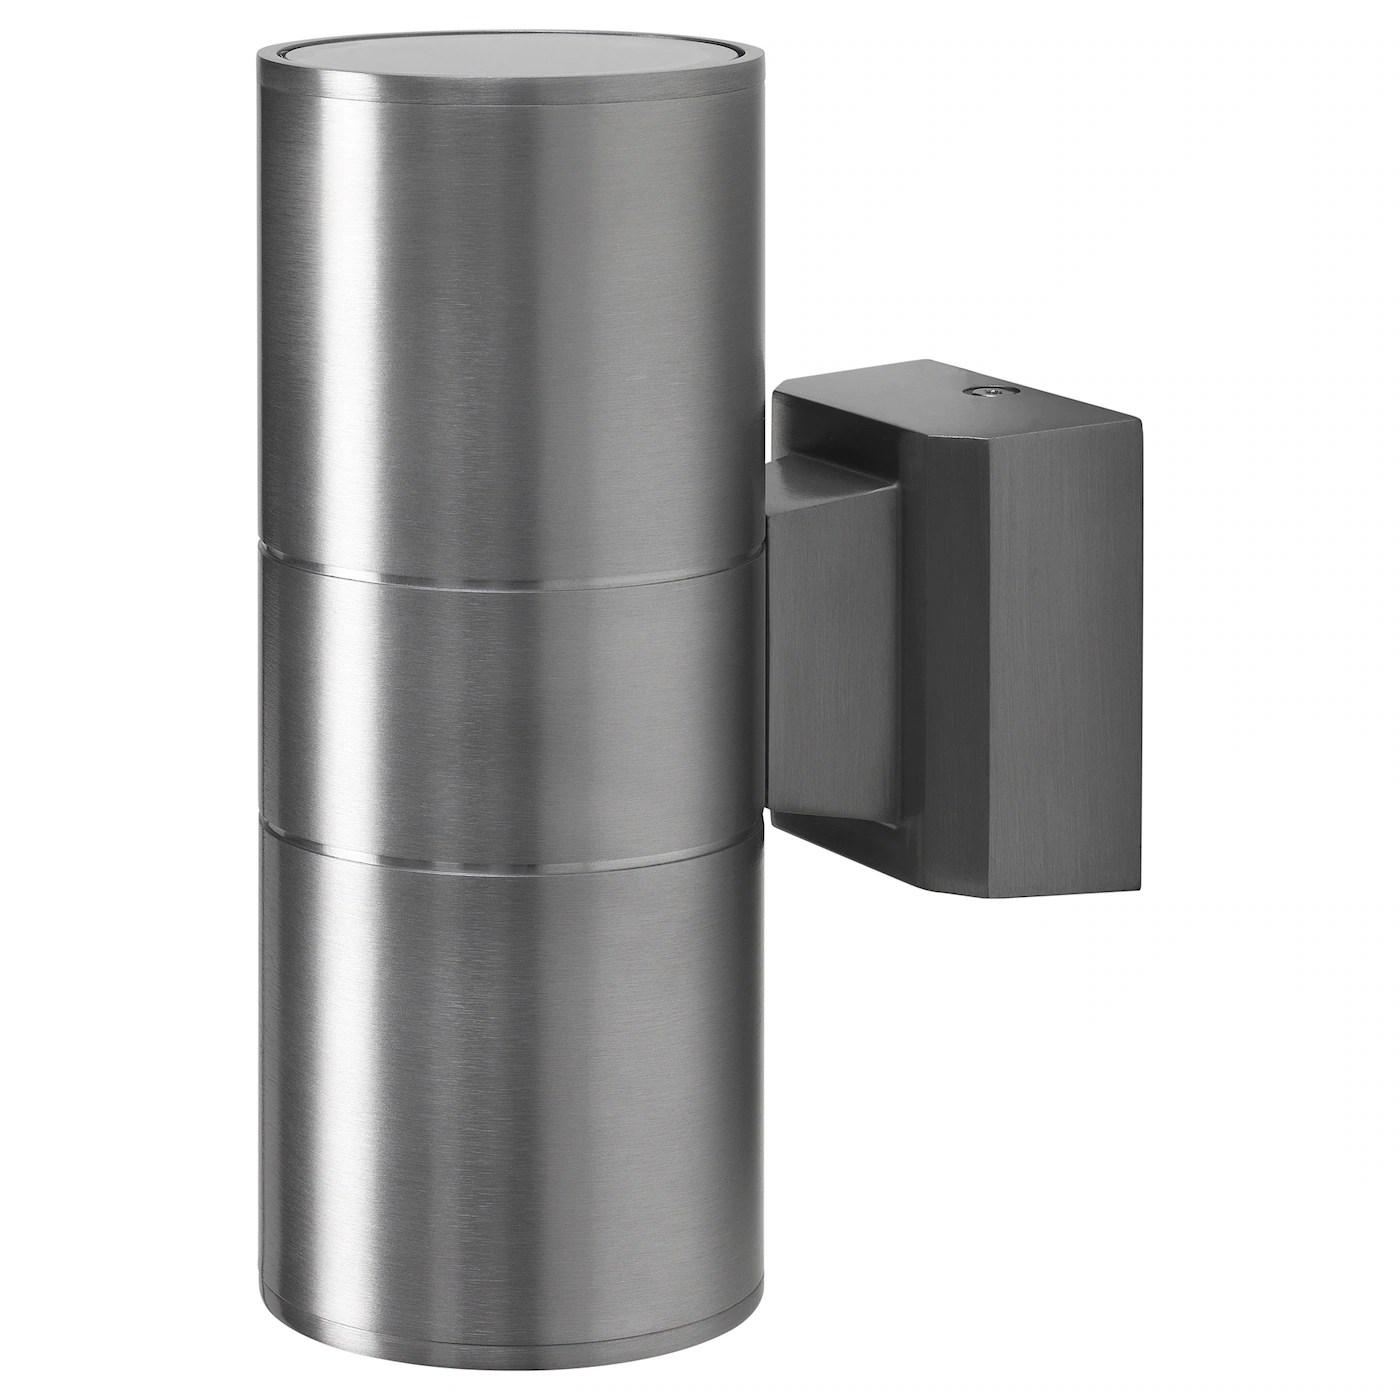 Allarp Applique Couleur Aluminium Ikea Ikea